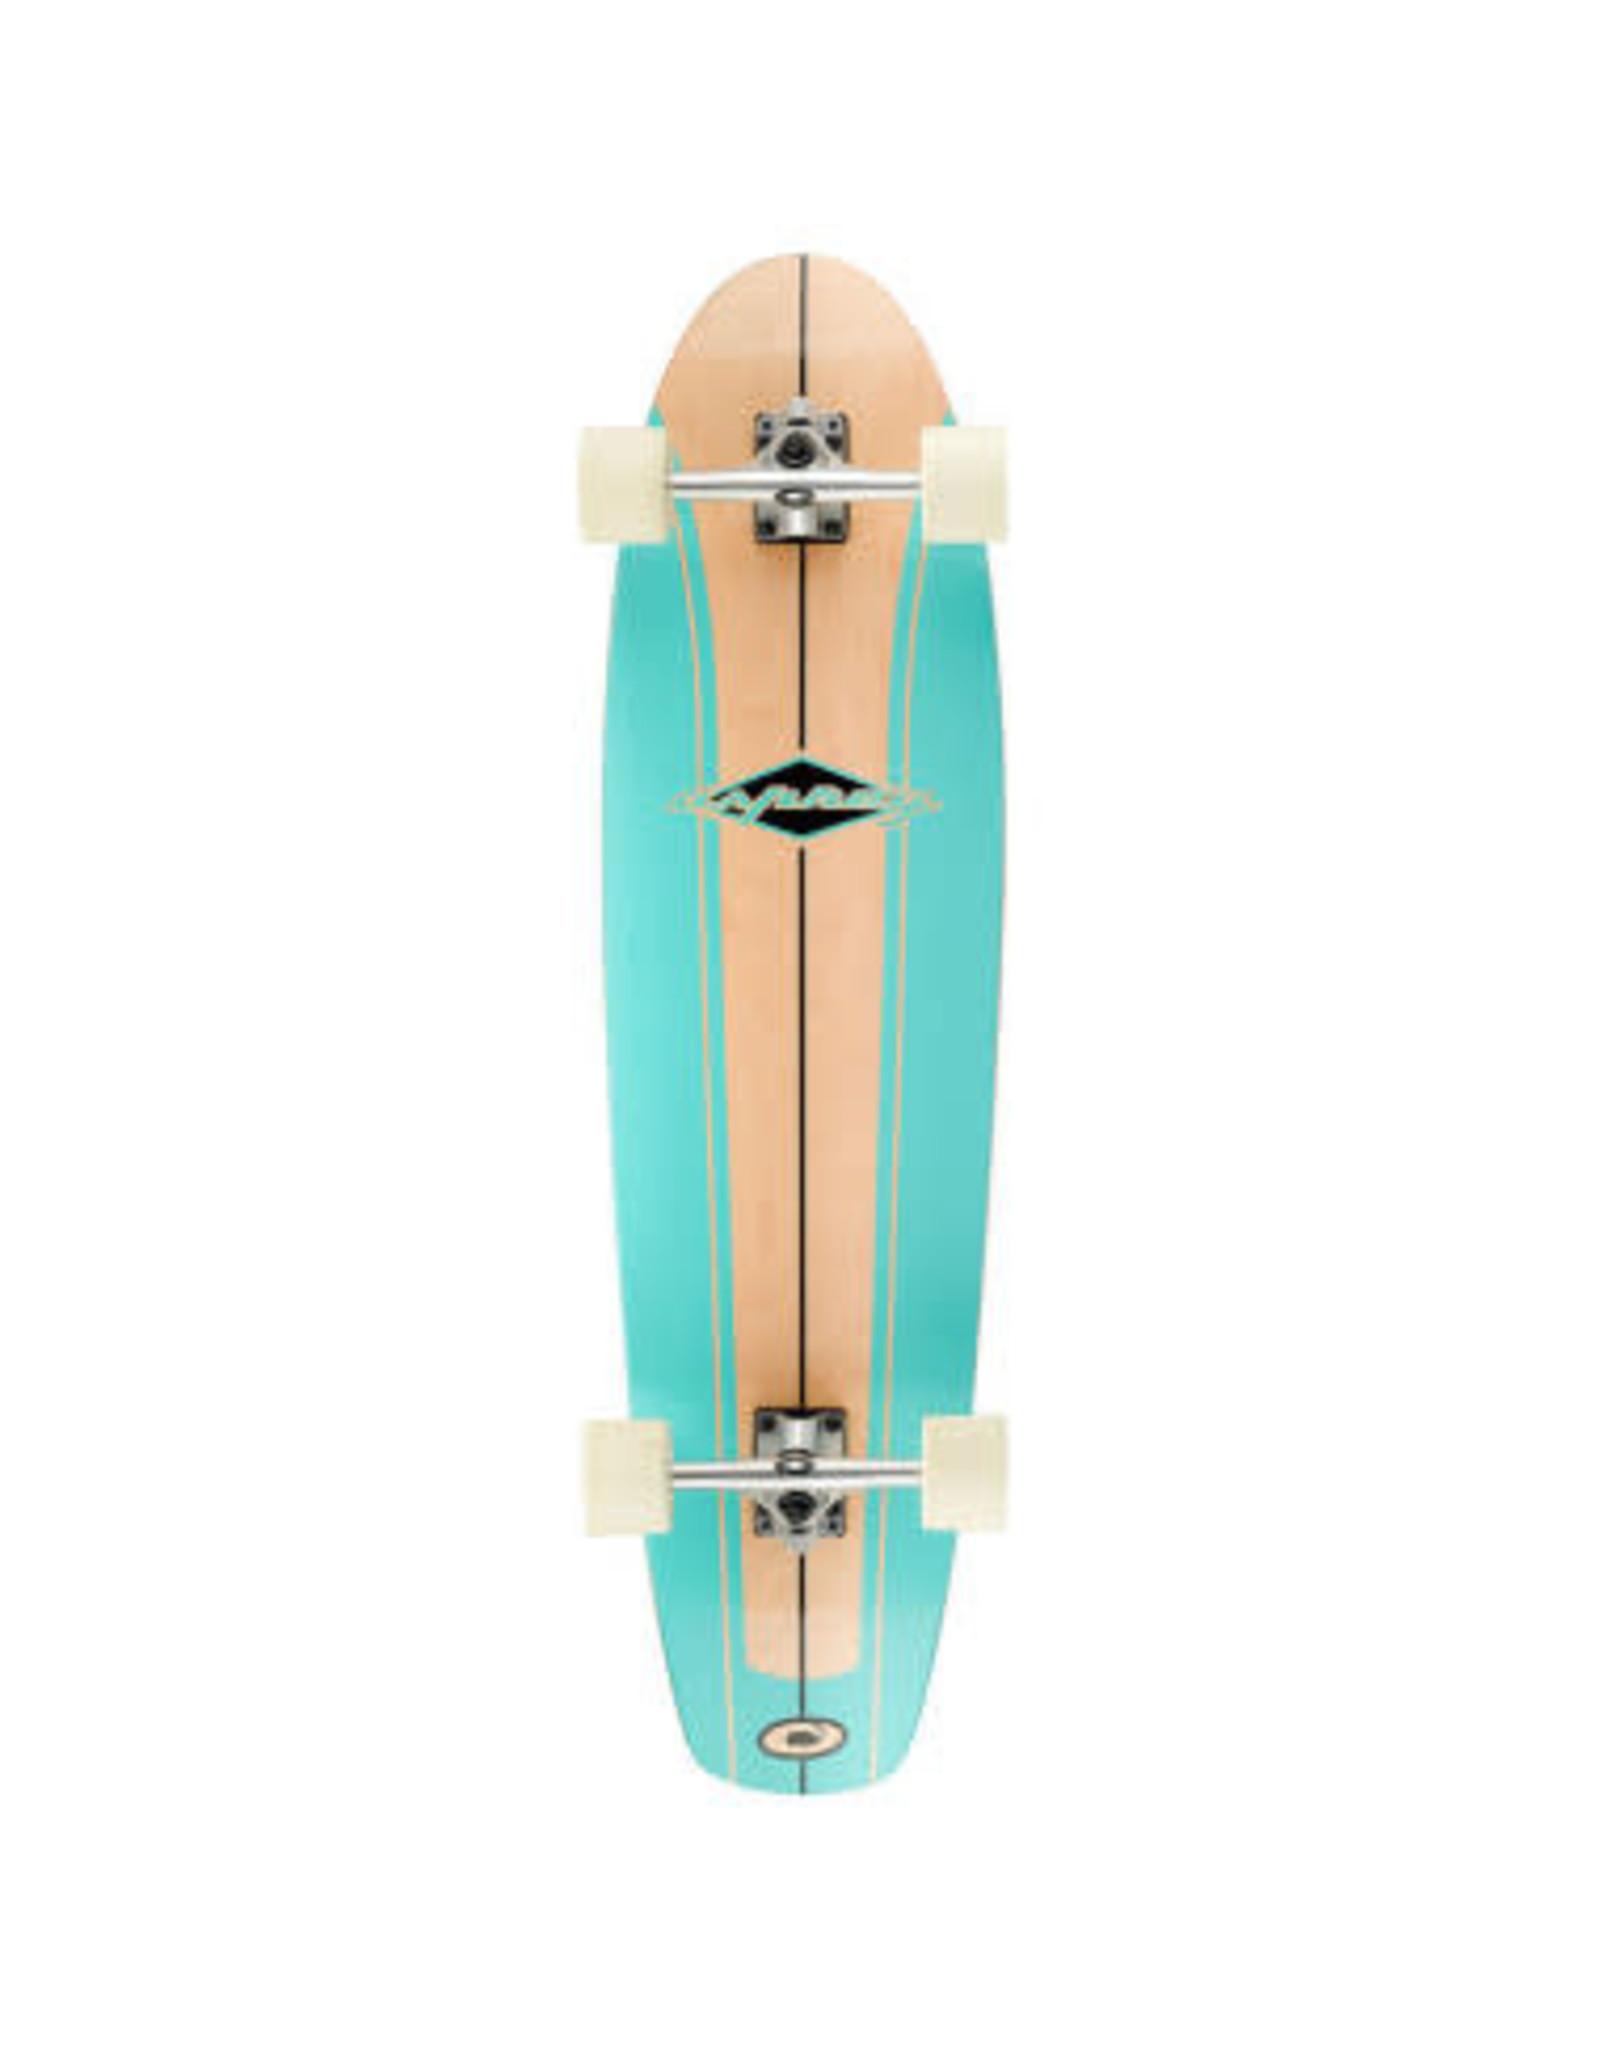 "Osprey Osprey Drive In 38"" Longboard Skateboard"